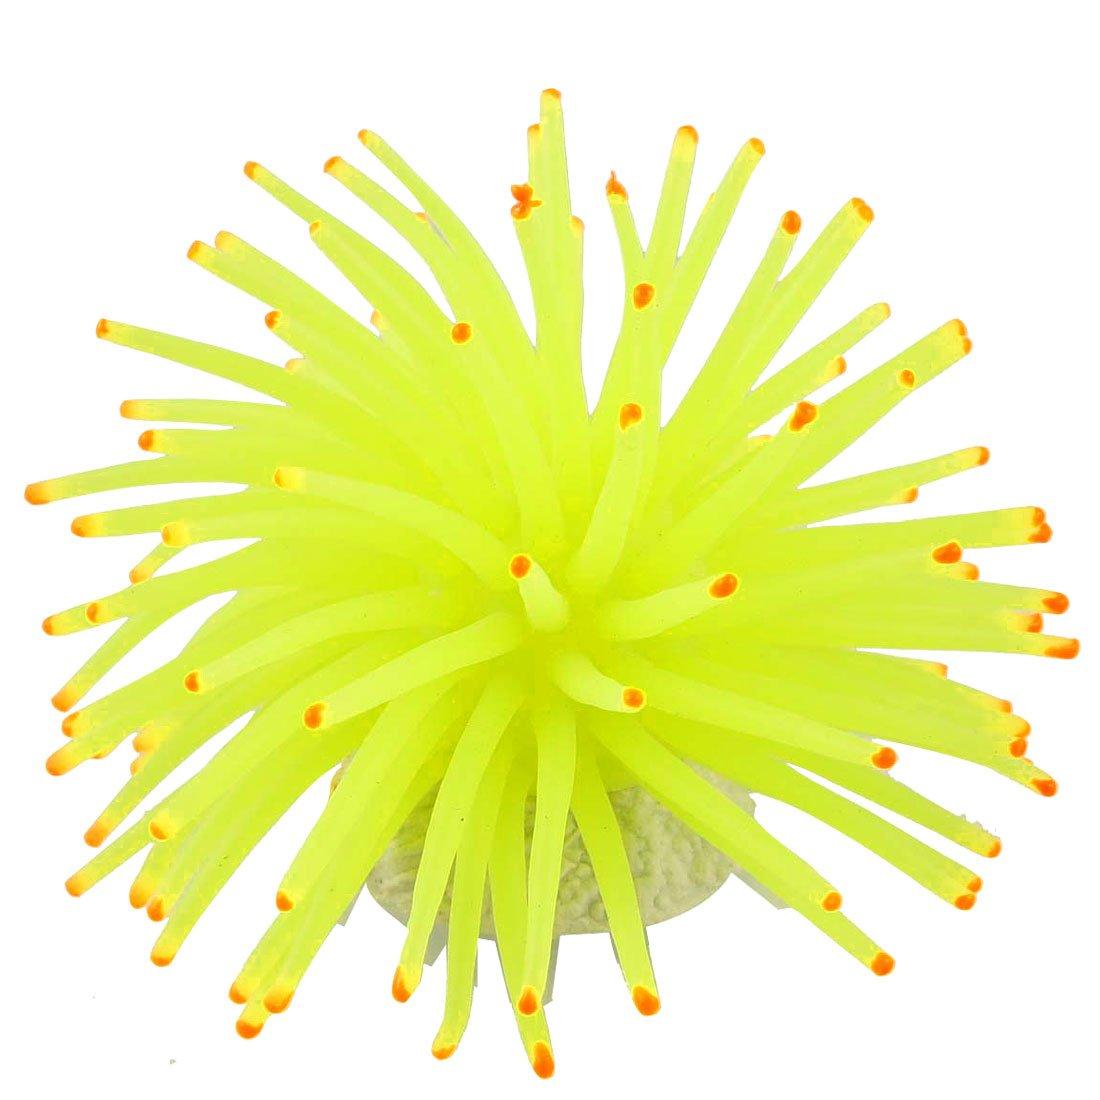 uxcell Round Ceramic Base Soft Silicone Aquarium Coral Ornament, Yellow/Green